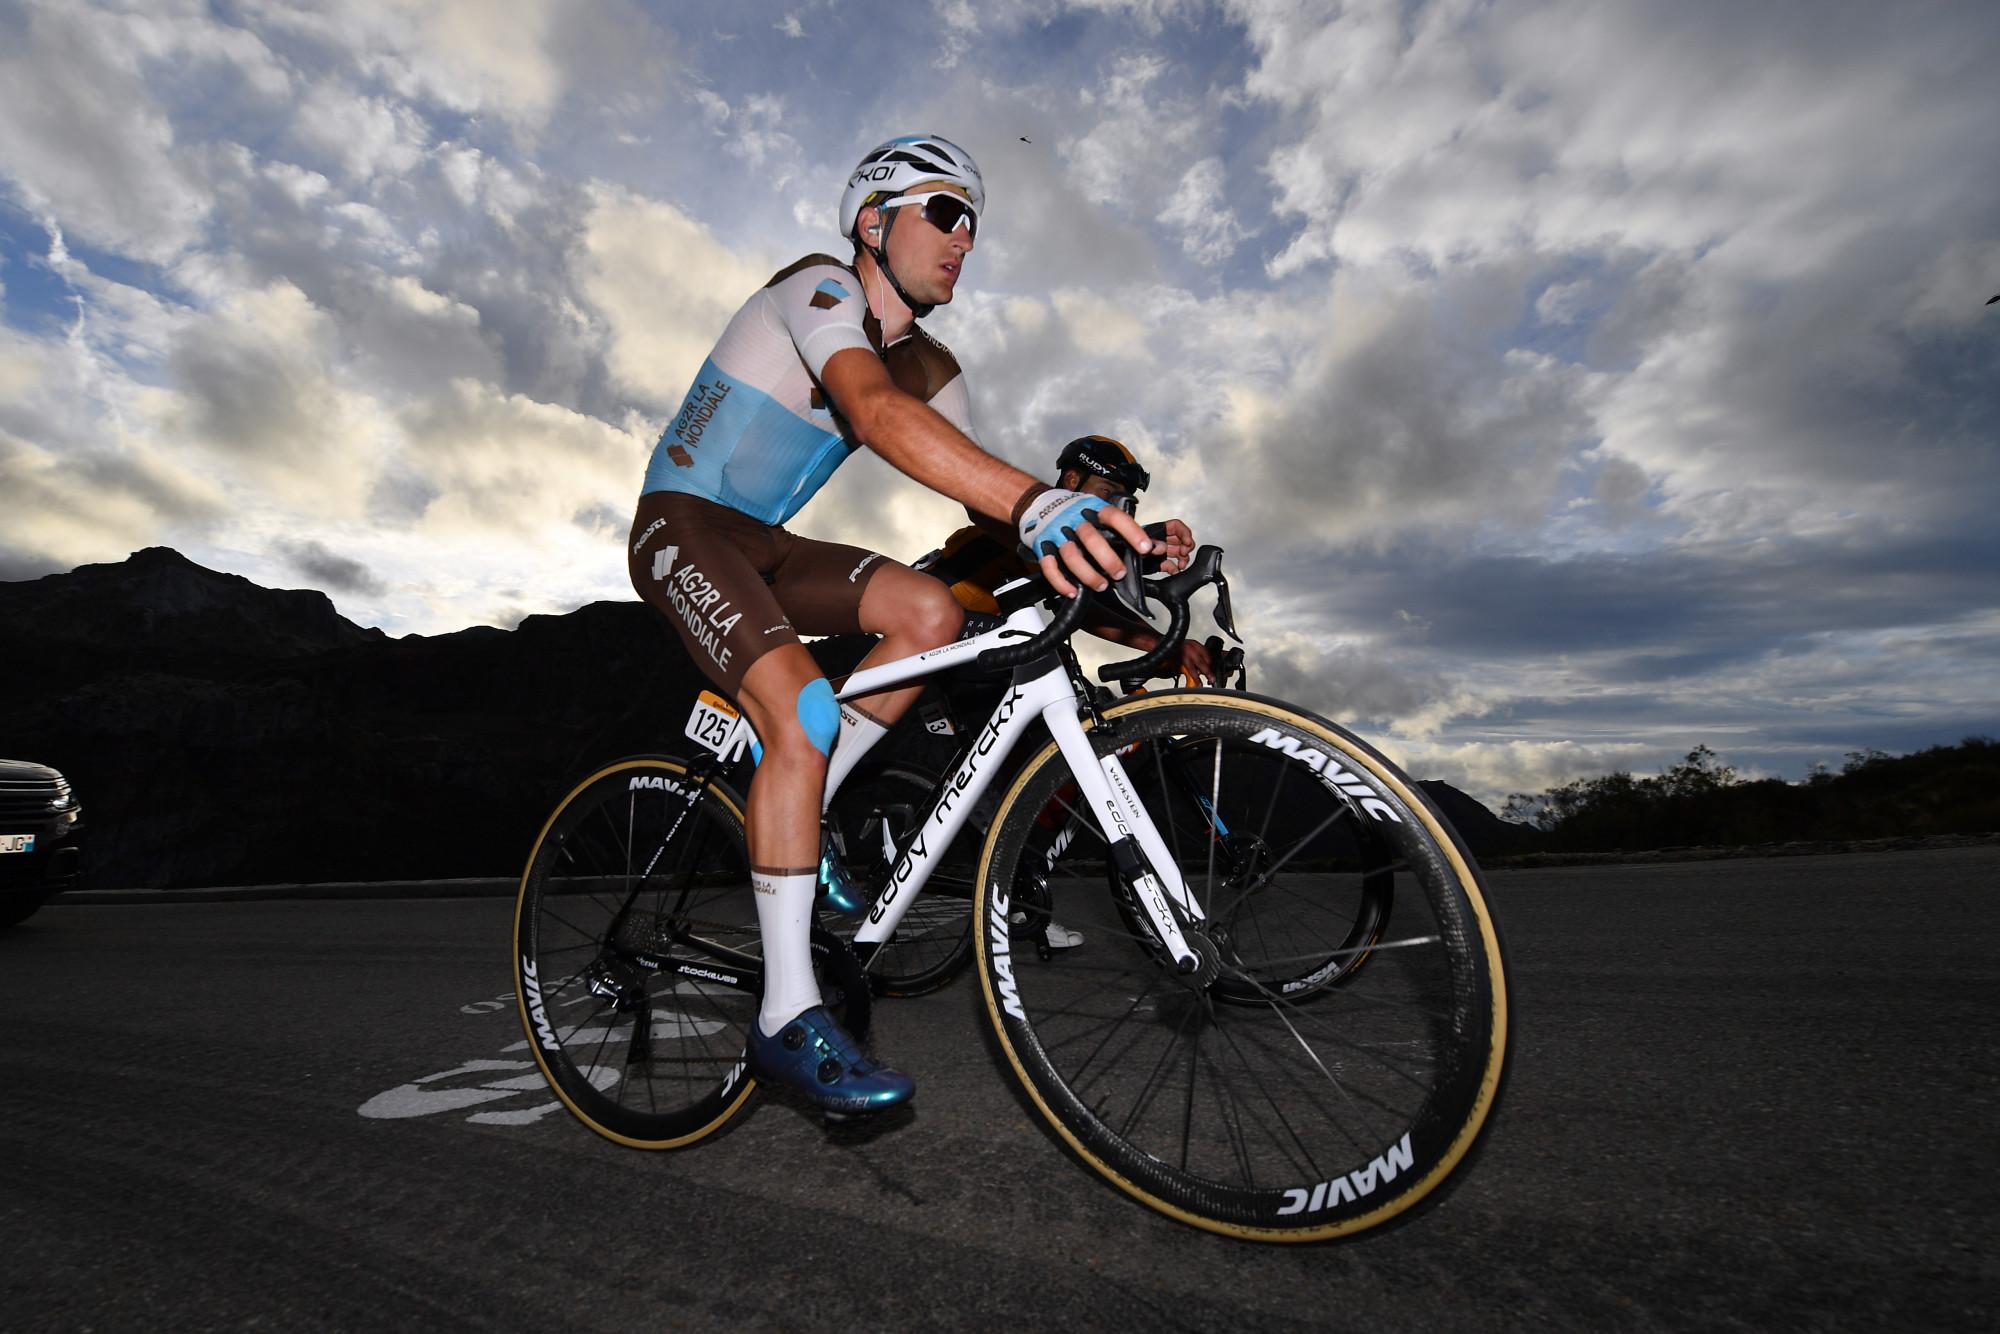 Nans Peters | La Vuelta ciclista a España - Stage 11